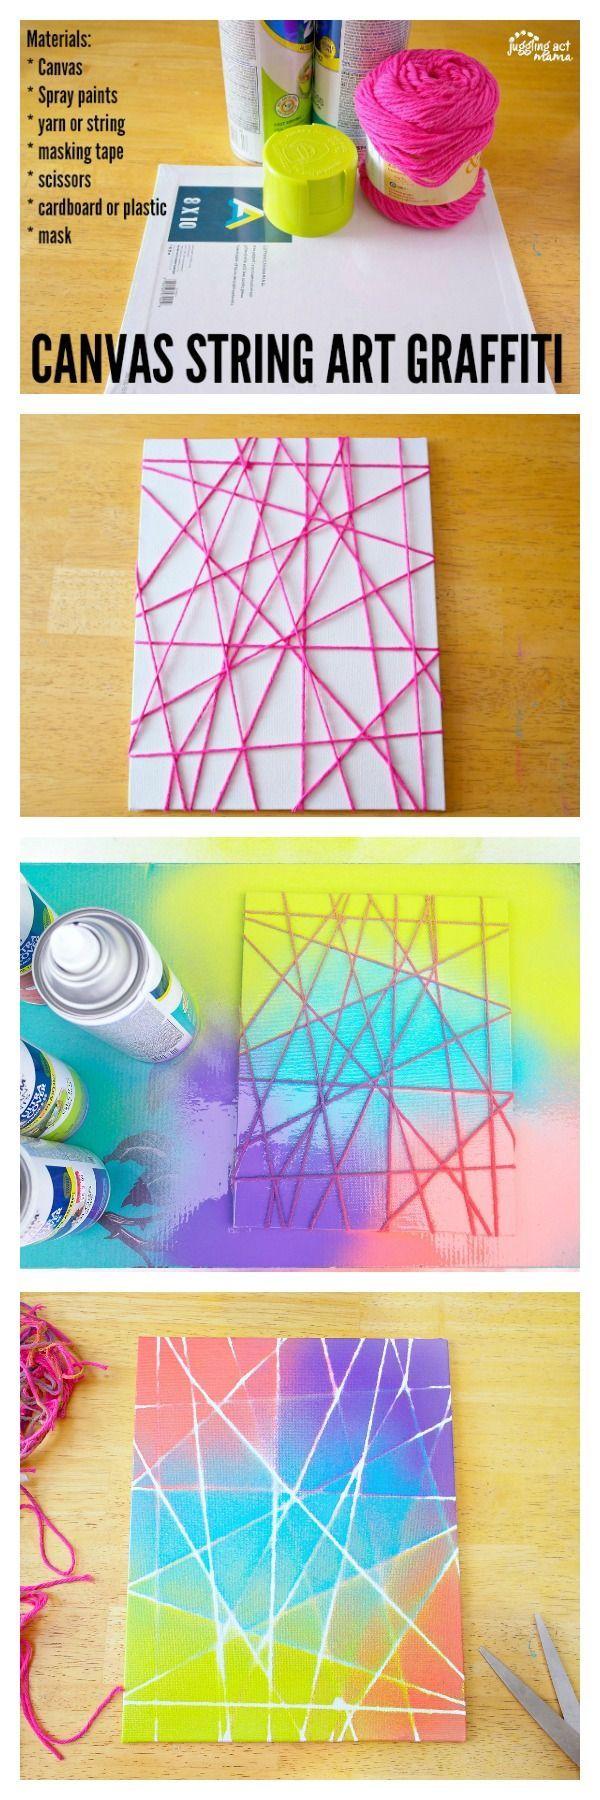 Canvas String Art Graffiti